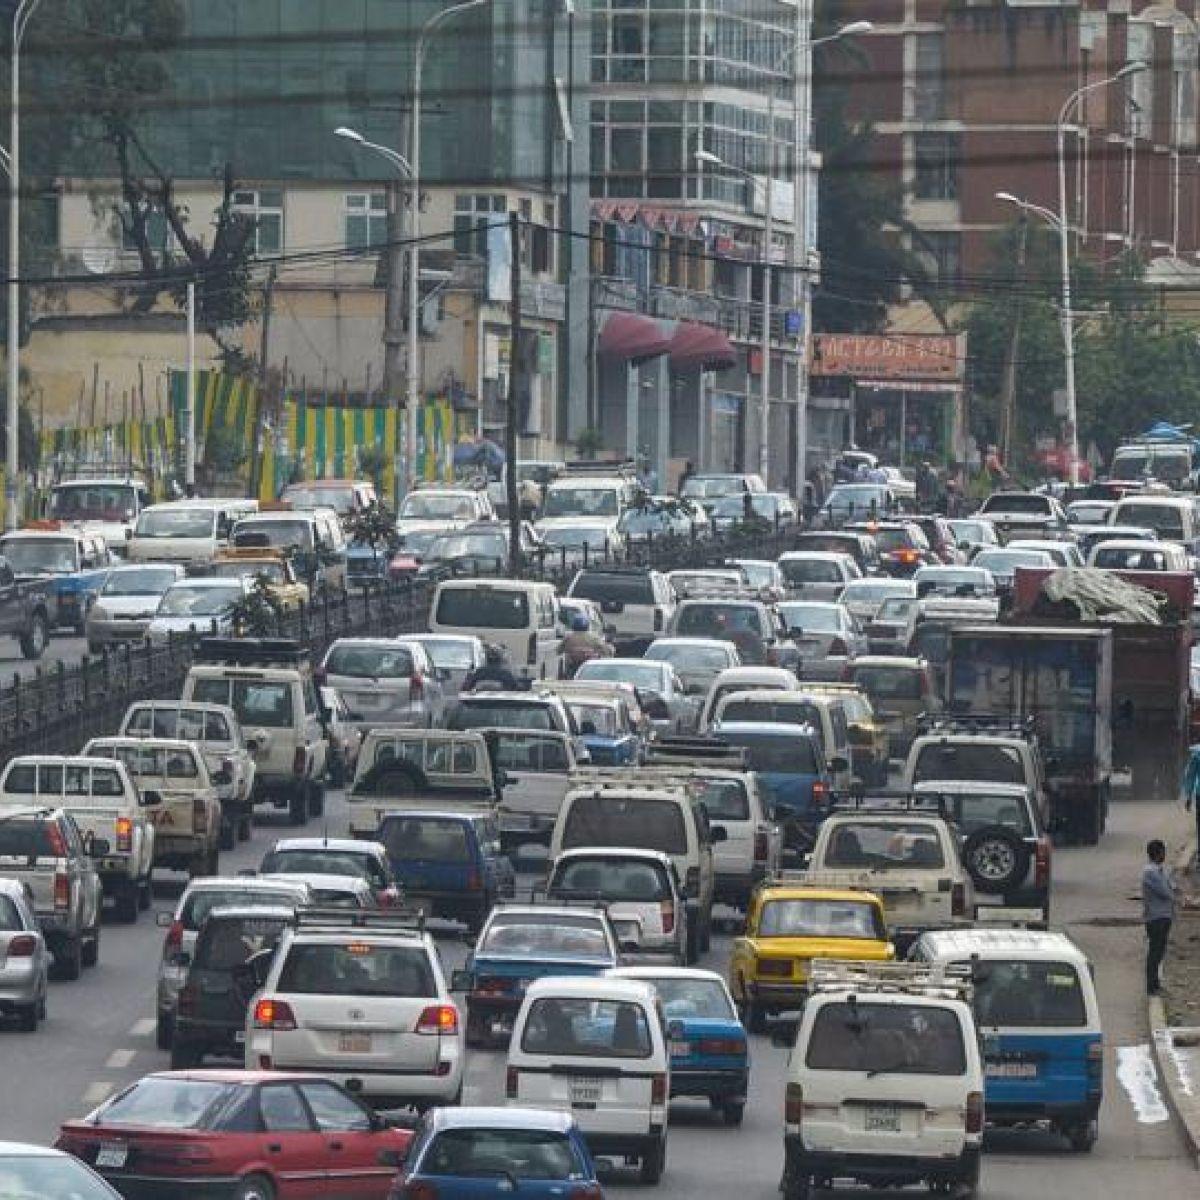 1993 Addis Ababa by Richard Hanson 2014